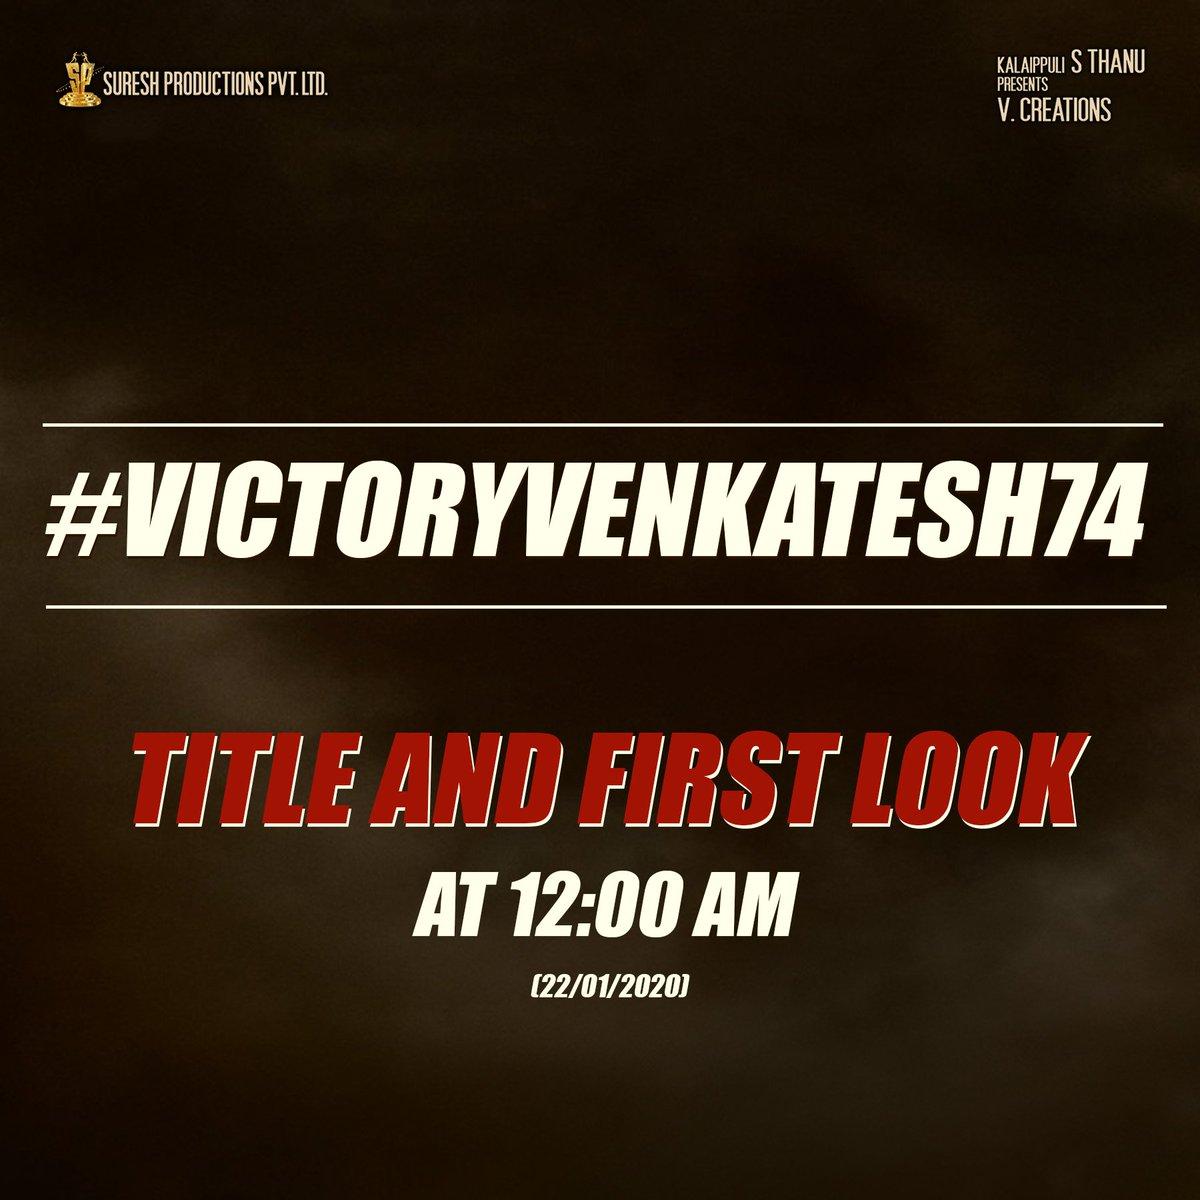 #VictoryVenkatesh74 Title & First Look on January 22nd 12 AM. @VenkyMama<br>http://pic.twitter.com/sfSjWjYSj5